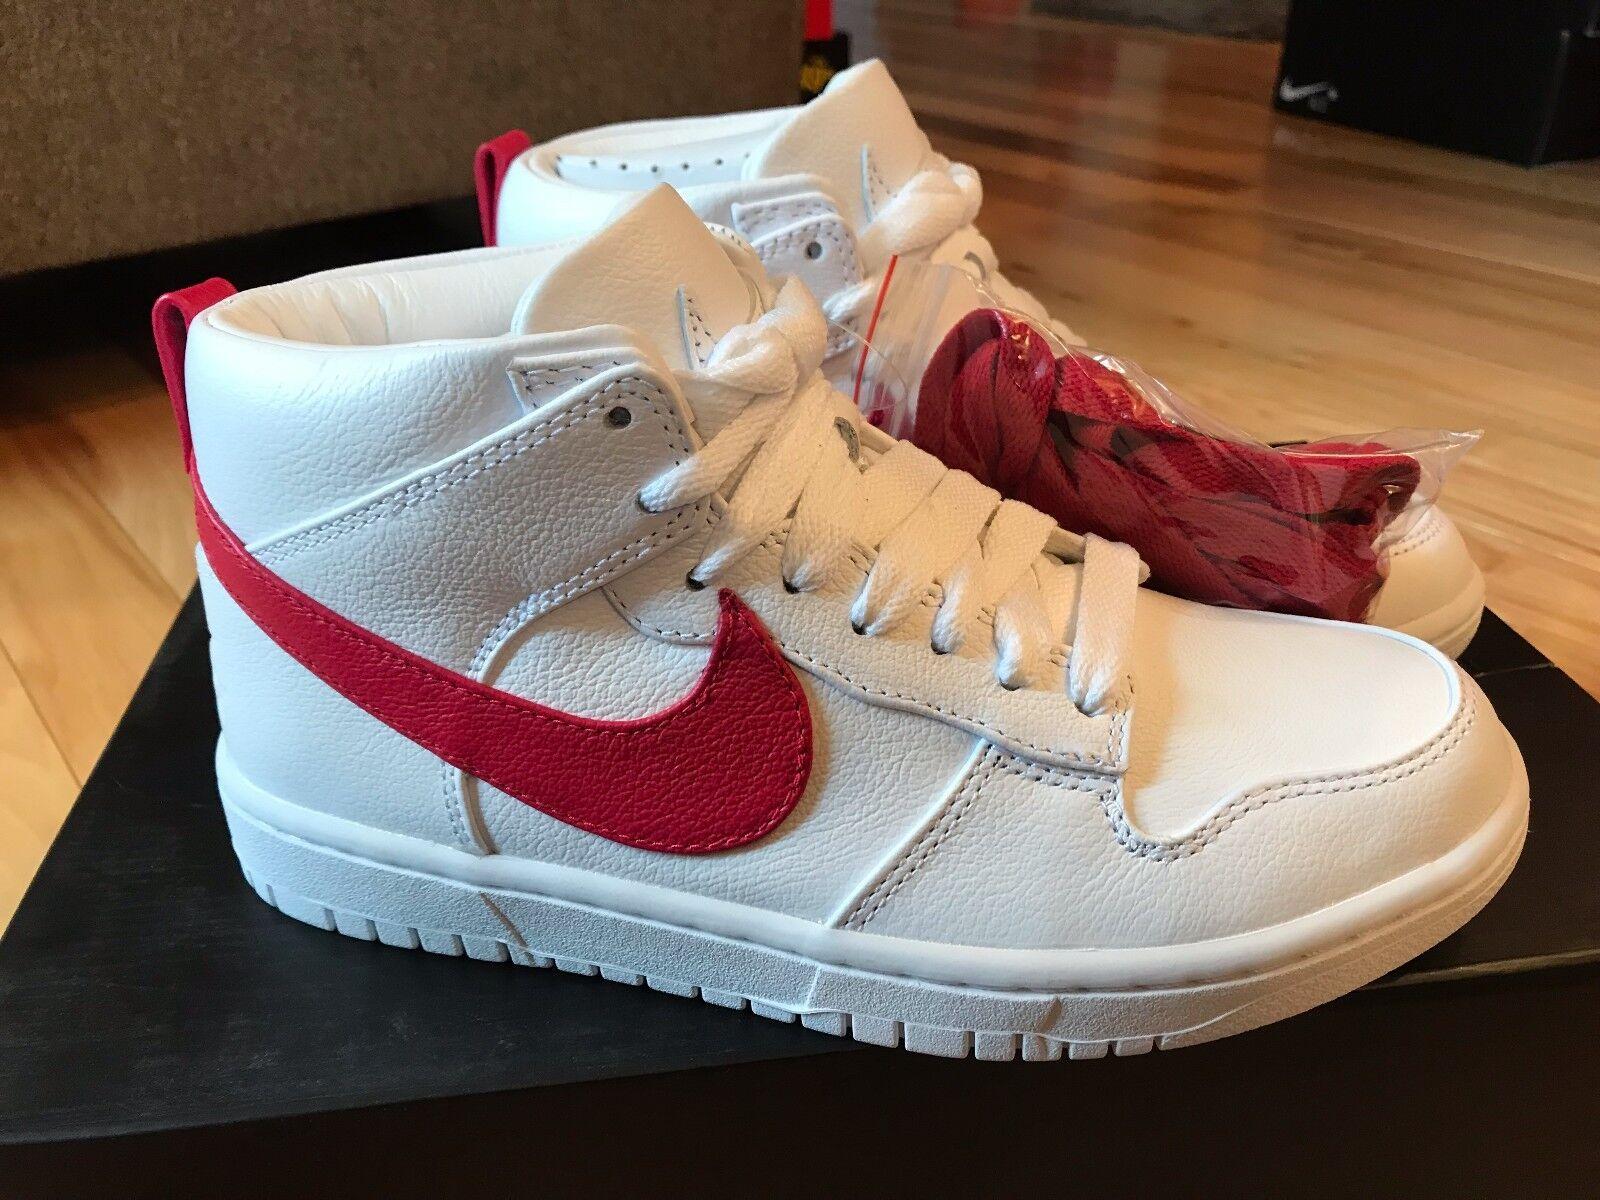 Nike nikelab schiacciare lux - chukka rt riccardo tisci bianco - rosso 910088-100 dimensioni 6